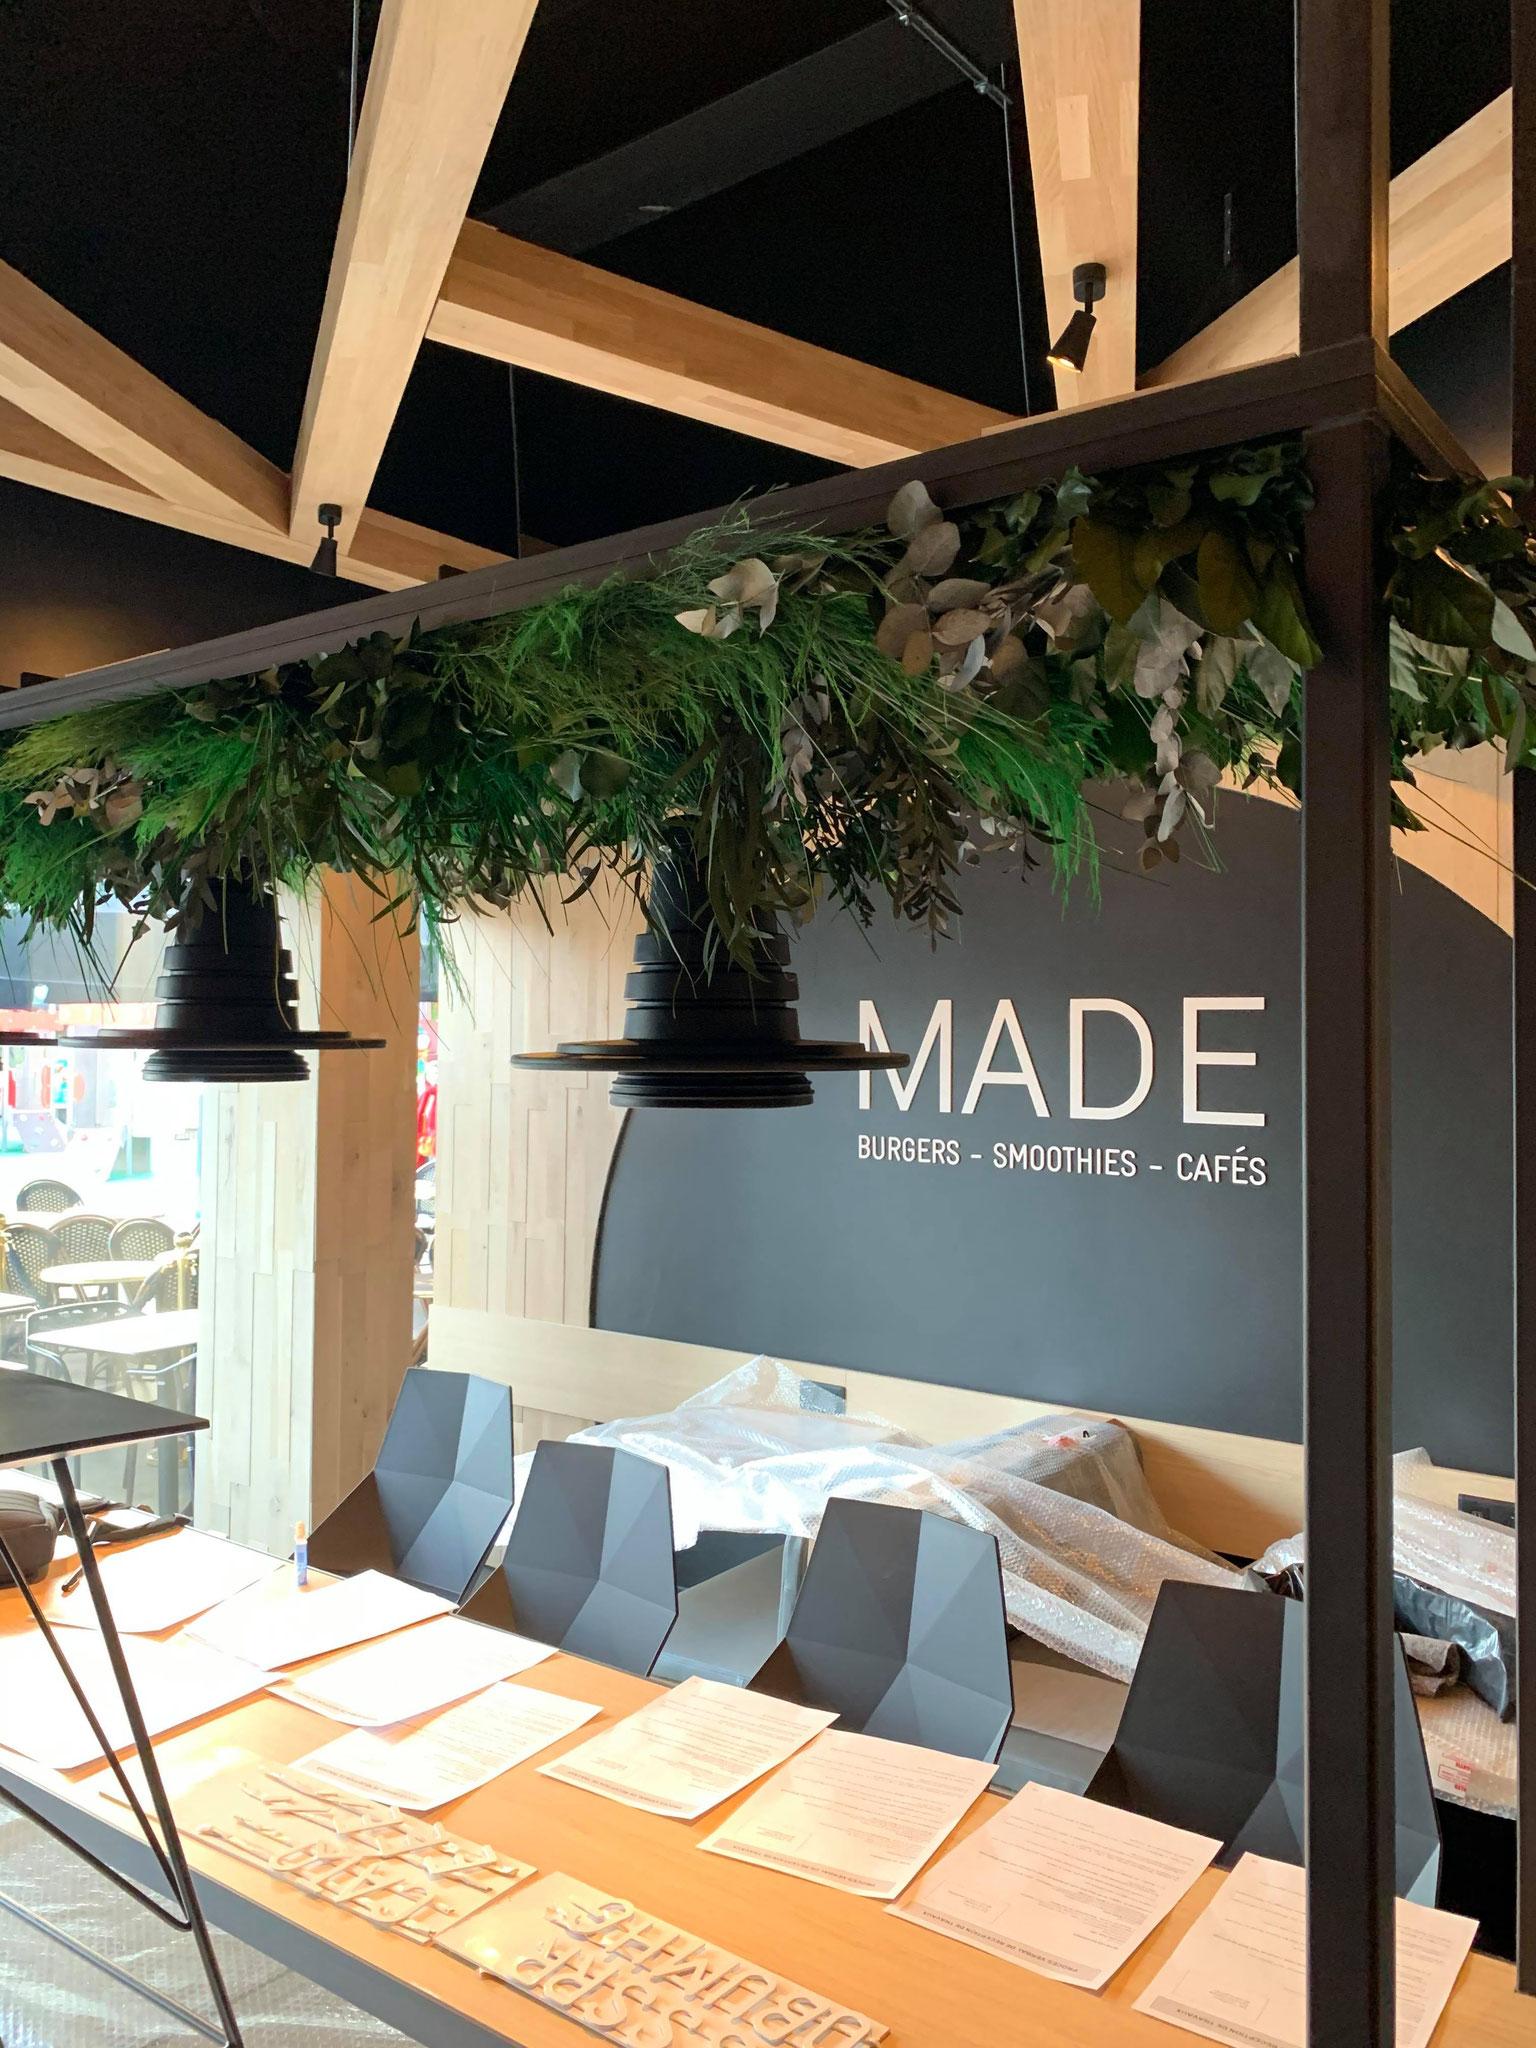 Plafond végétal gamme feuillu (MADE)